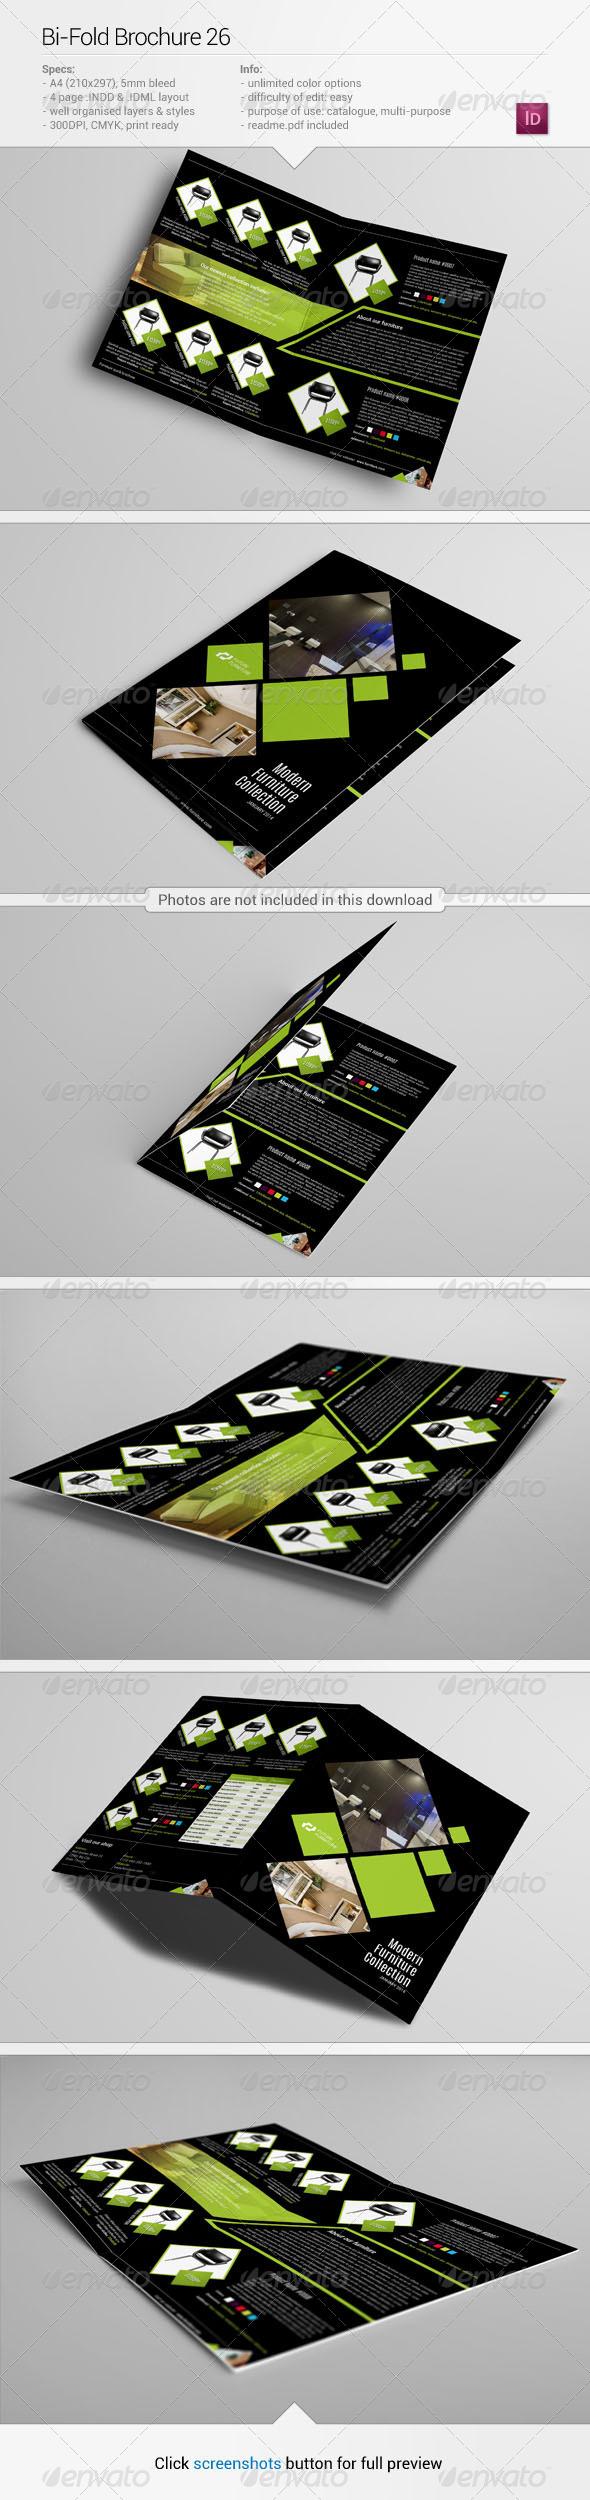 GraphicRiver Bi-Fold Brochure 26 5811250